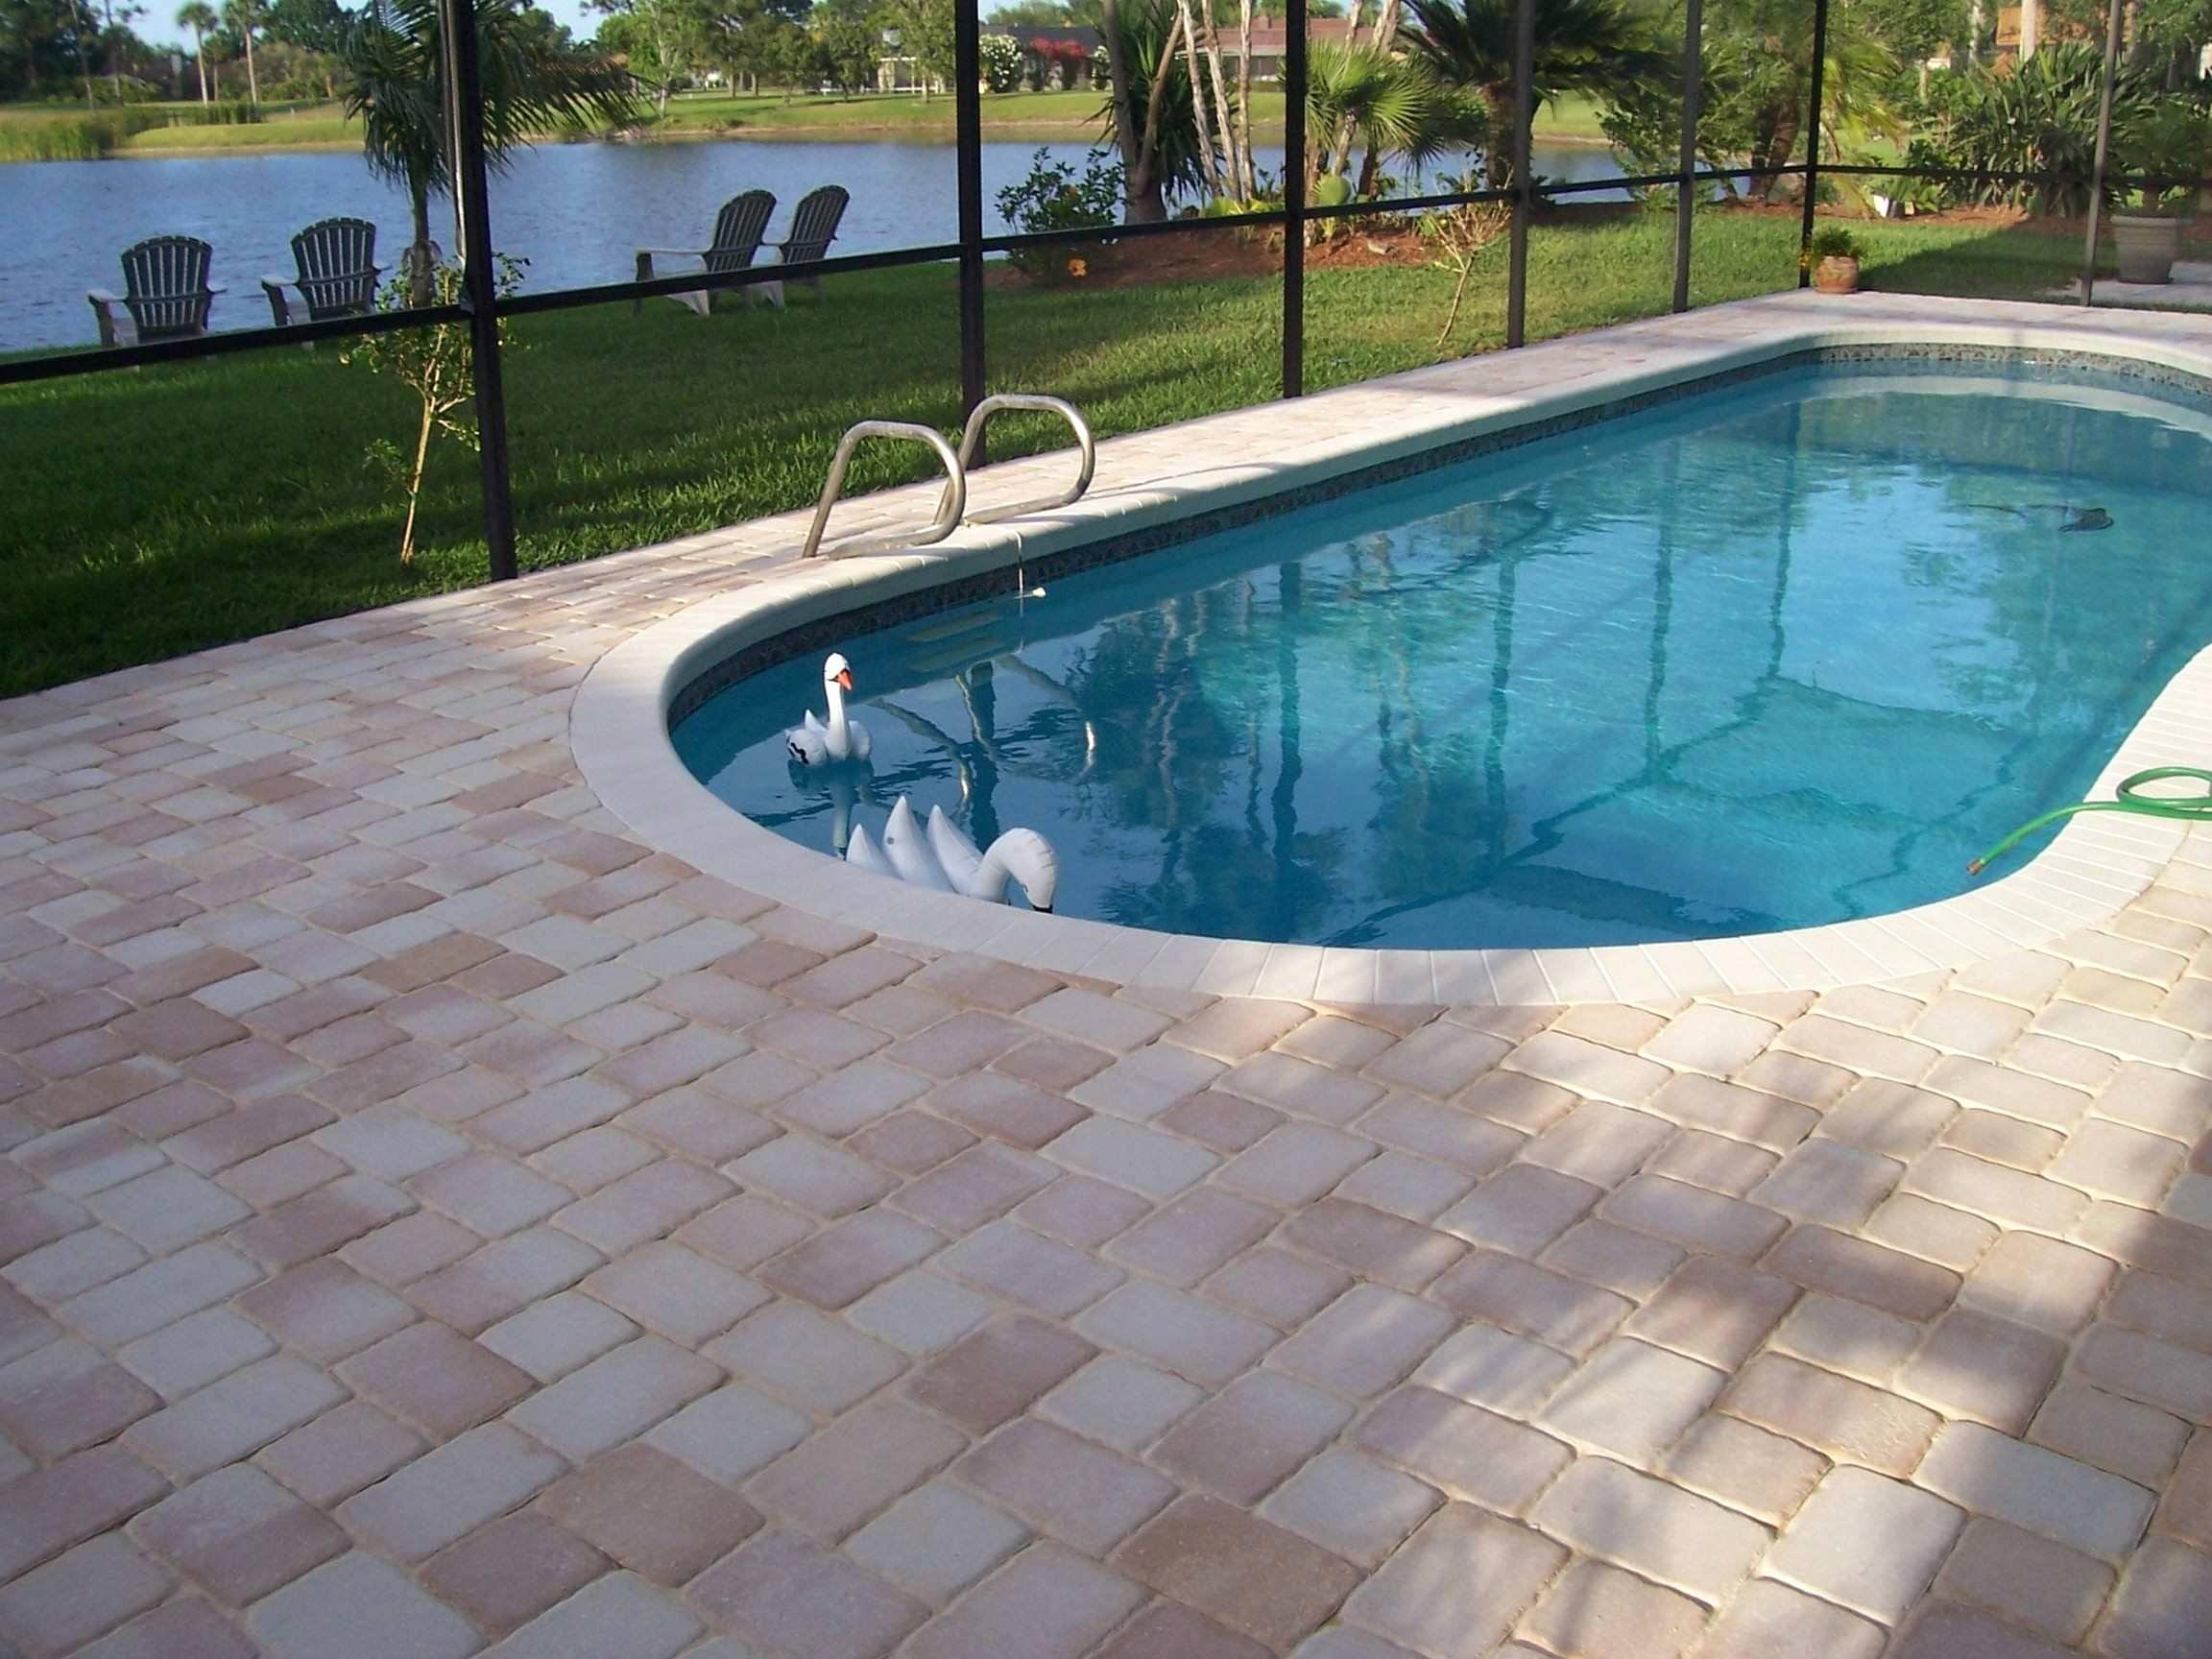 luxus pool neu elegant swimming pool landscaping garden ideas of luxus pool